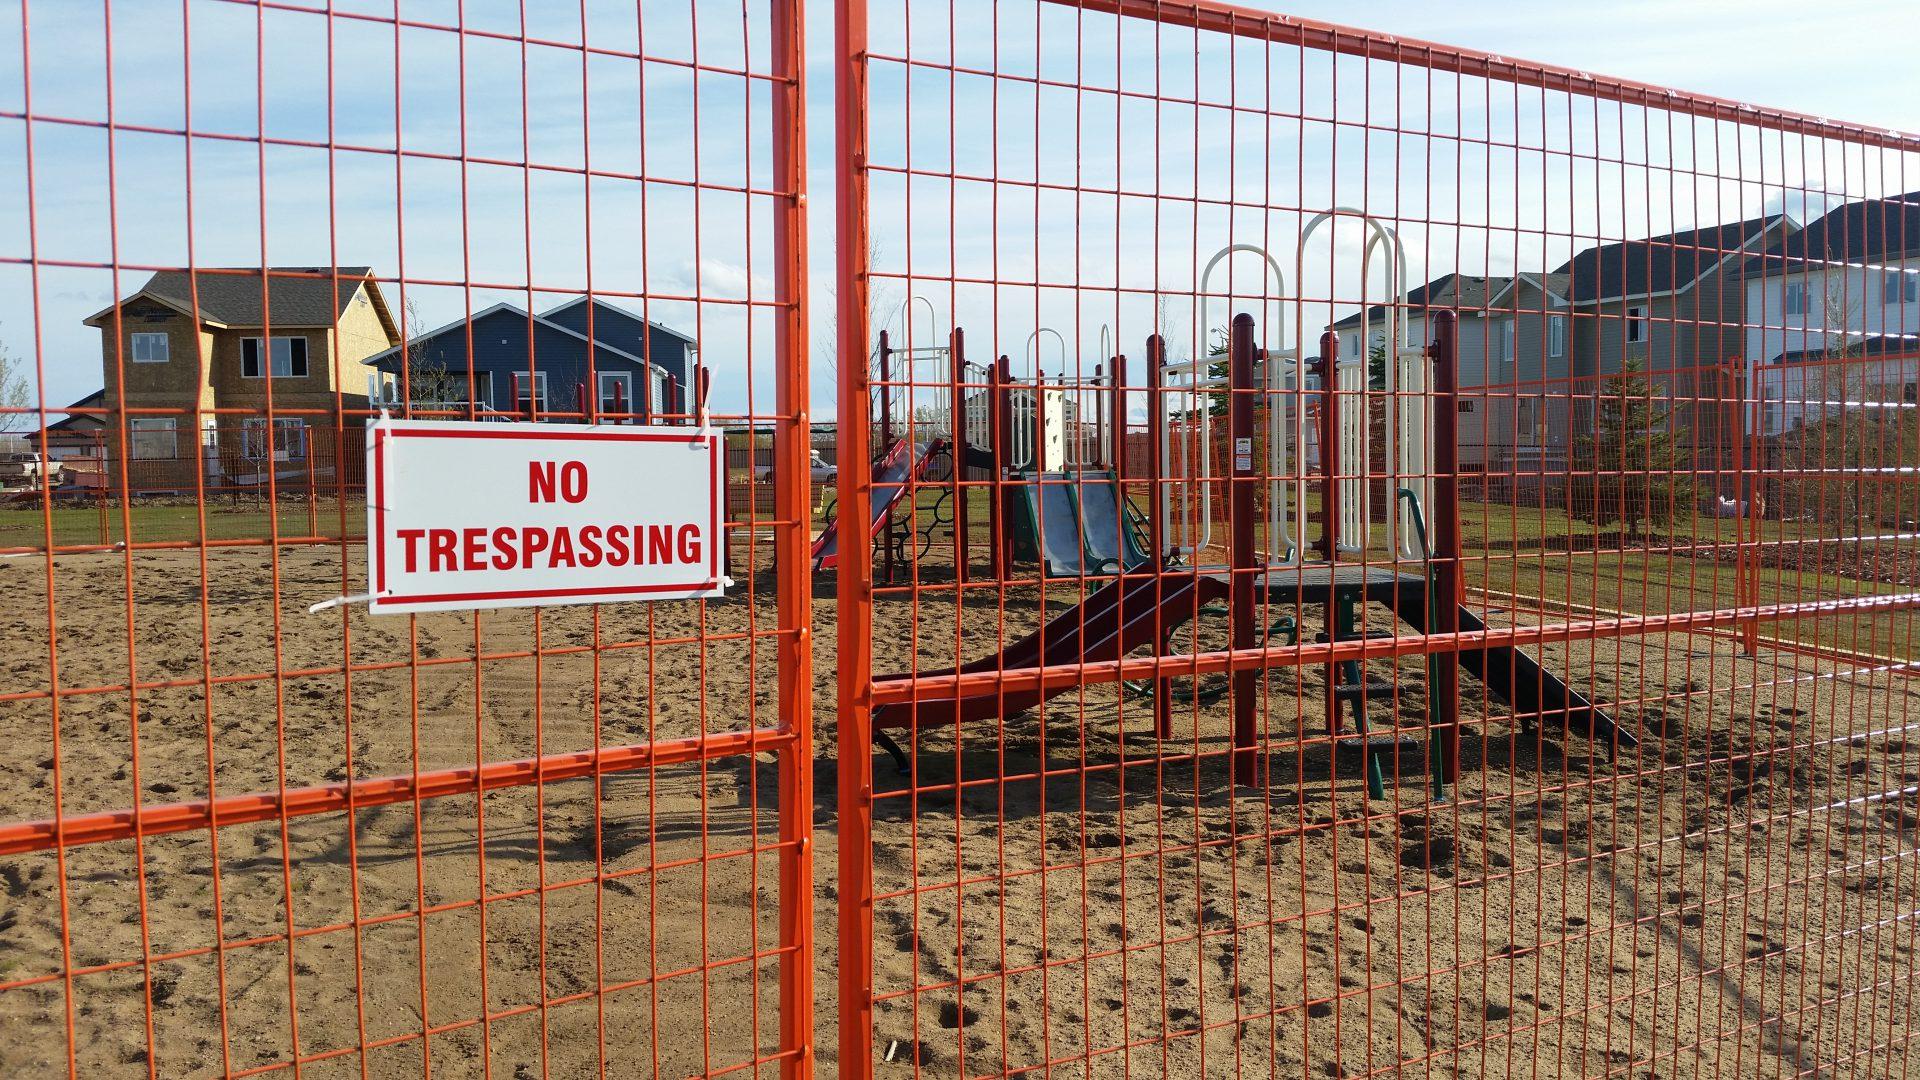 Children Warned Against Using Unsafe Playground My